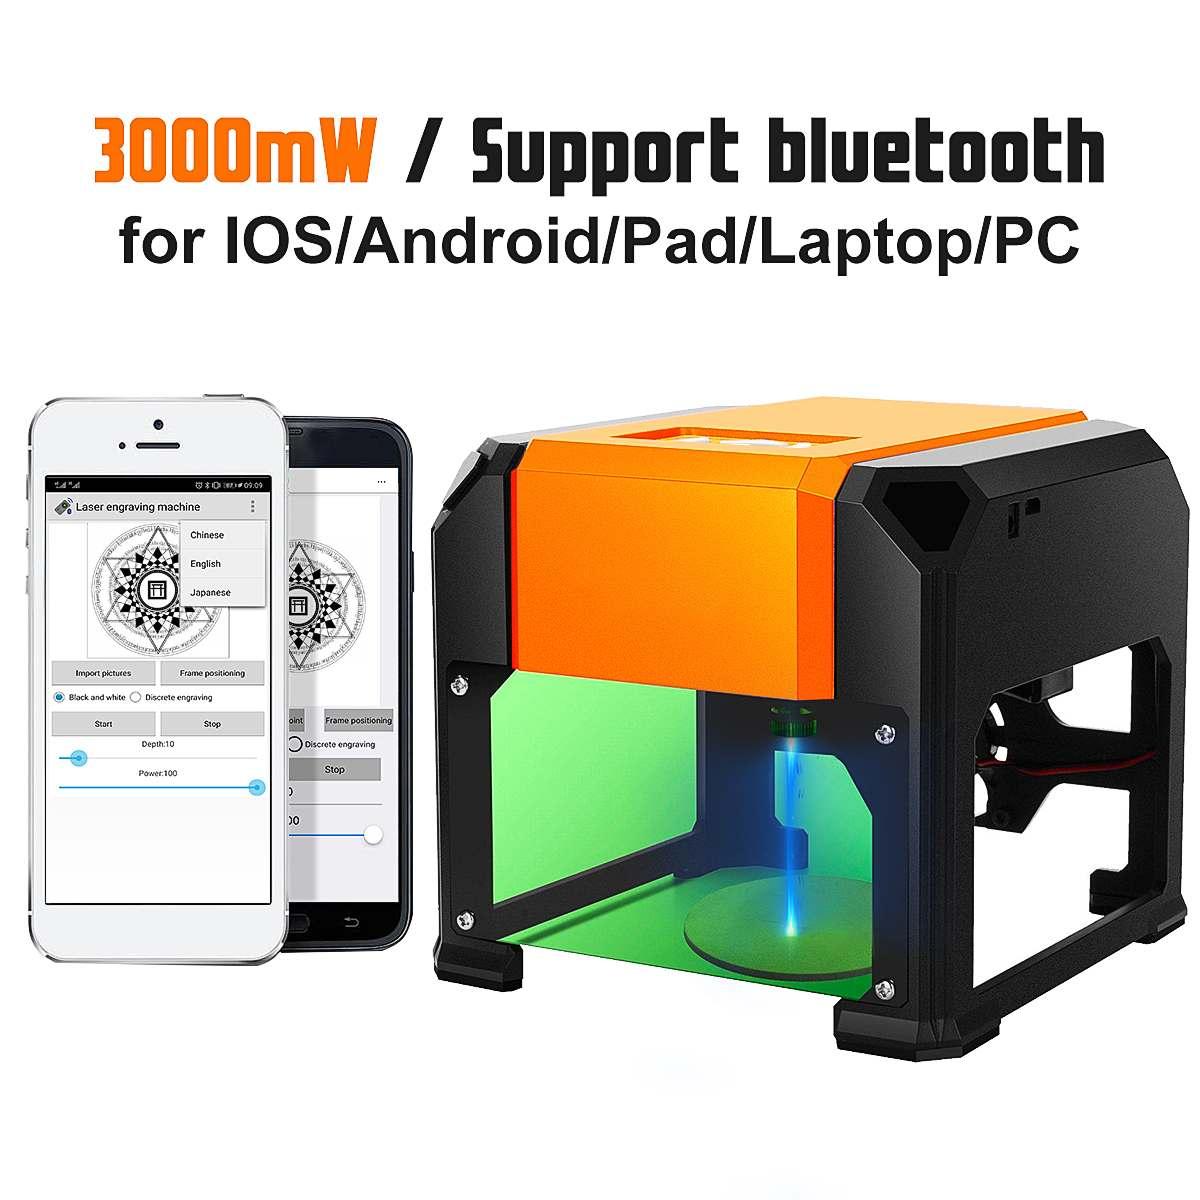 3000mW Bluetooth Desktop CNC Laser Engraving Machine USB Logo Marking Engraver Printer DIY Carving Cutter For IOS/Android